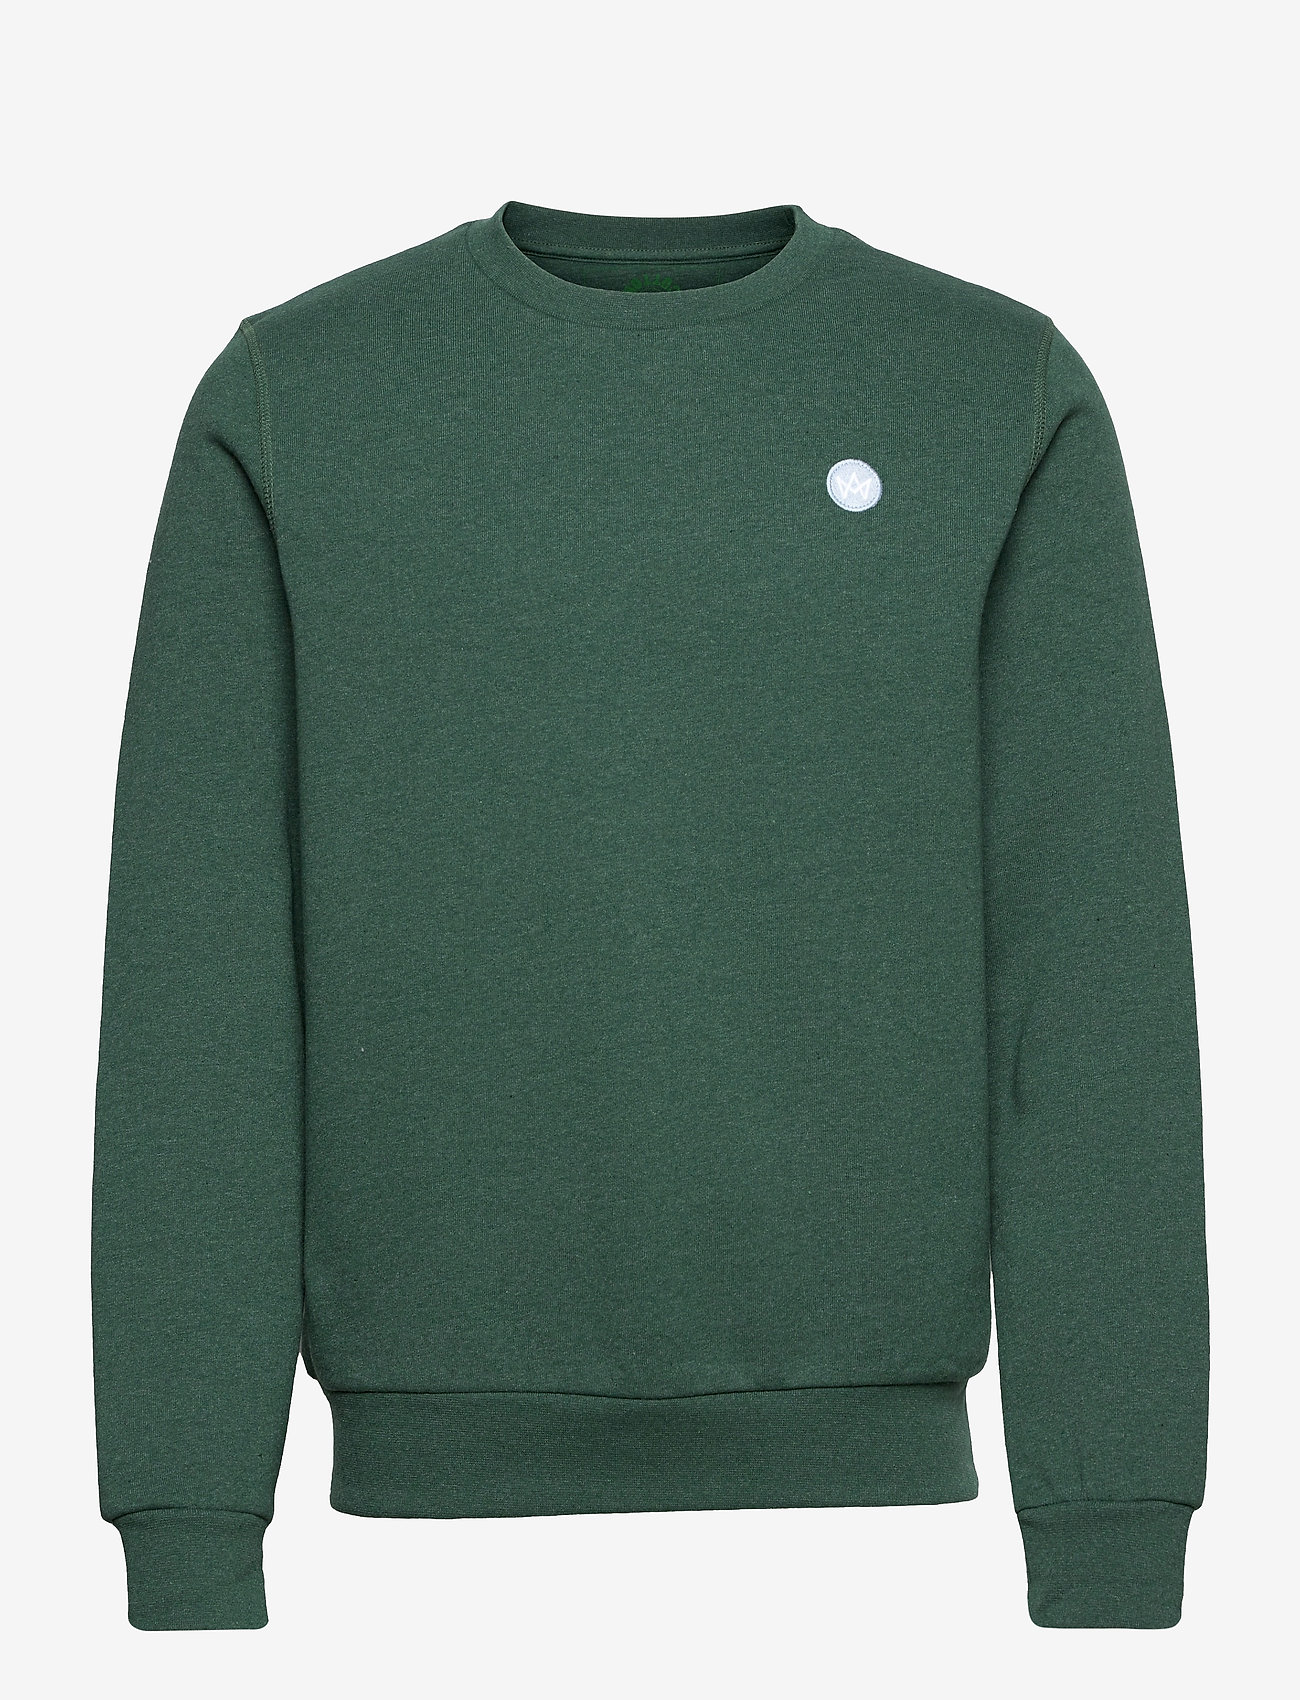 Kronstadt - Lars Recycled cotton sweat - sweats - olive - 0